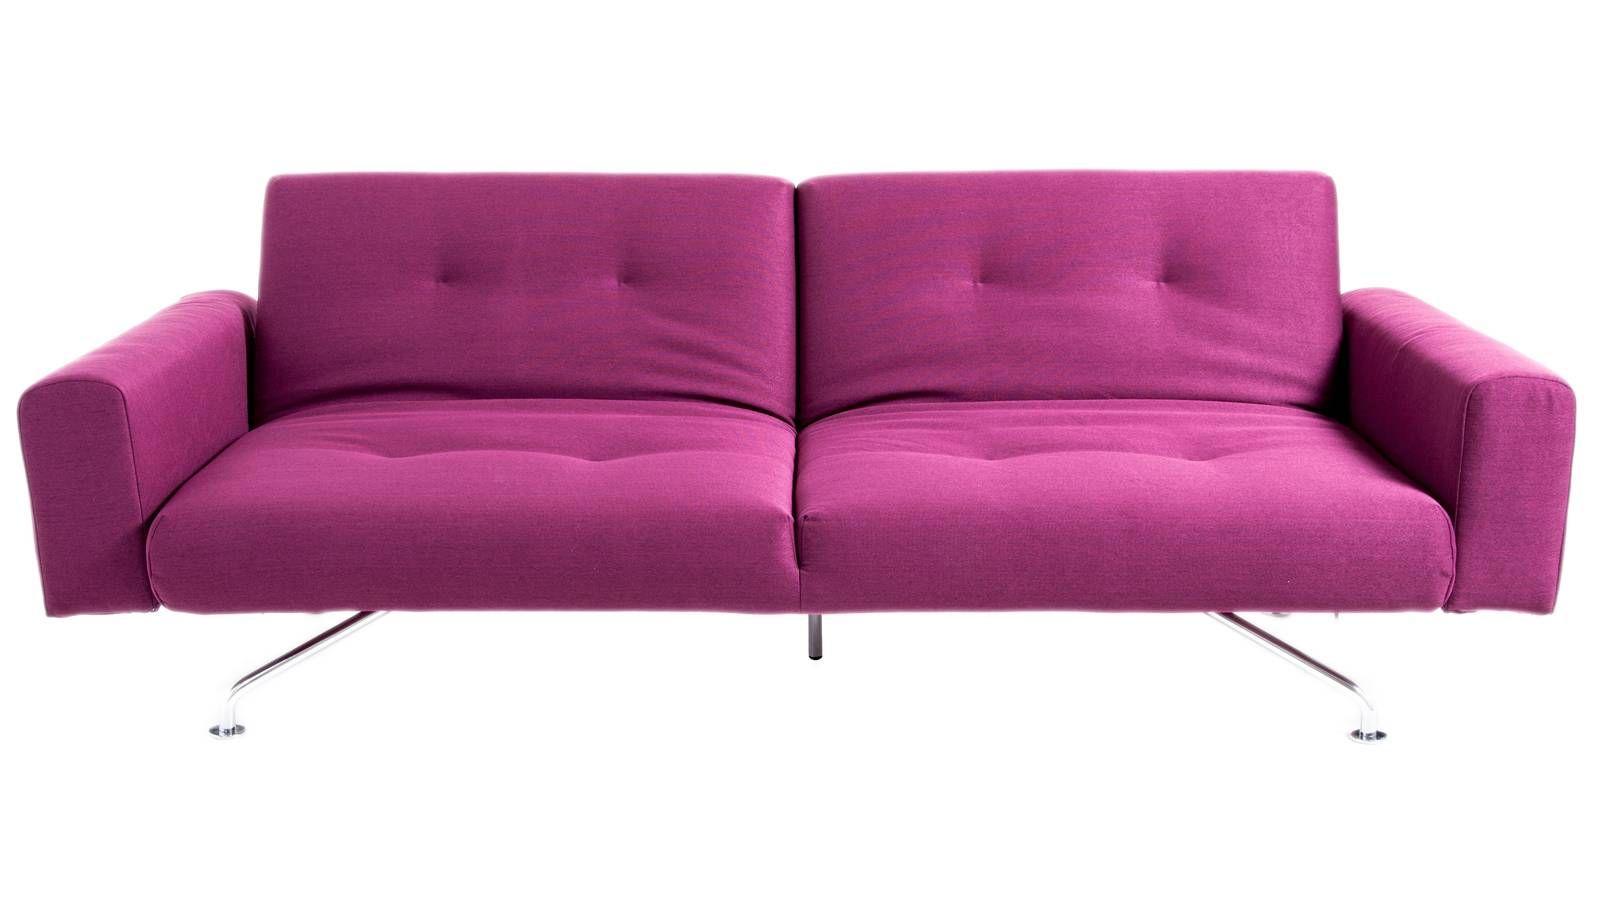 Rosa Spindeln bäddsoffa Stålben, soffa, vardagsrum, sovrum http  sweef se soffor 102 spindeln